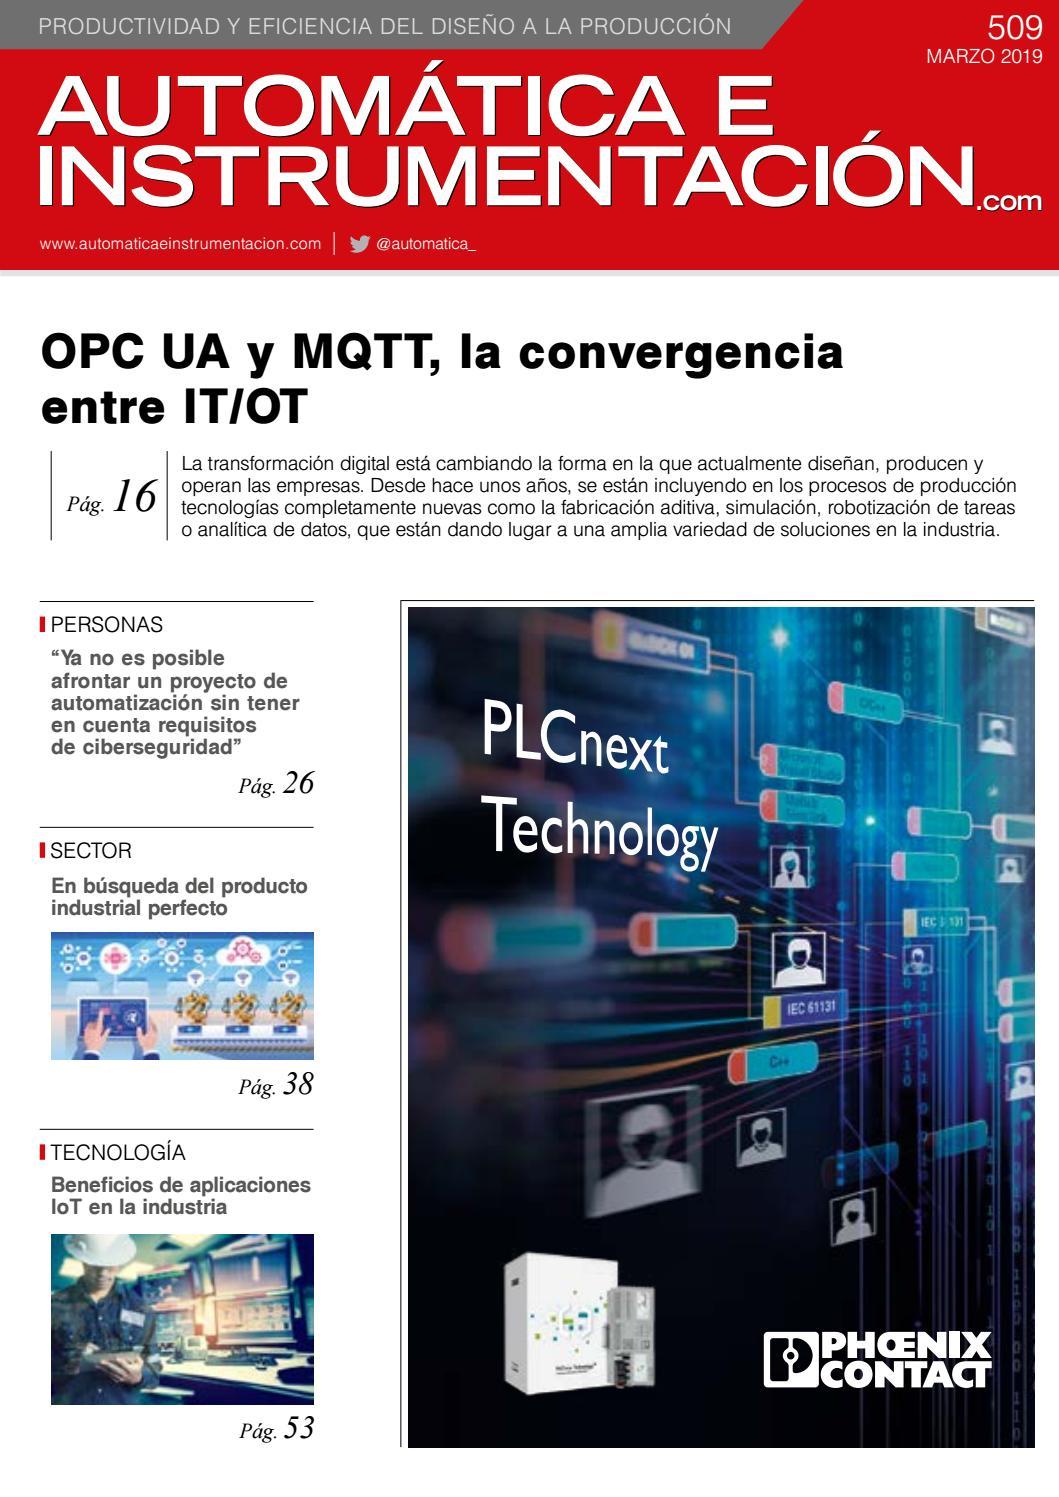 fc19a030 Automática e Instrumentación - nº 509 by Versys Ediciones Técnicas, S.L. -  issuu